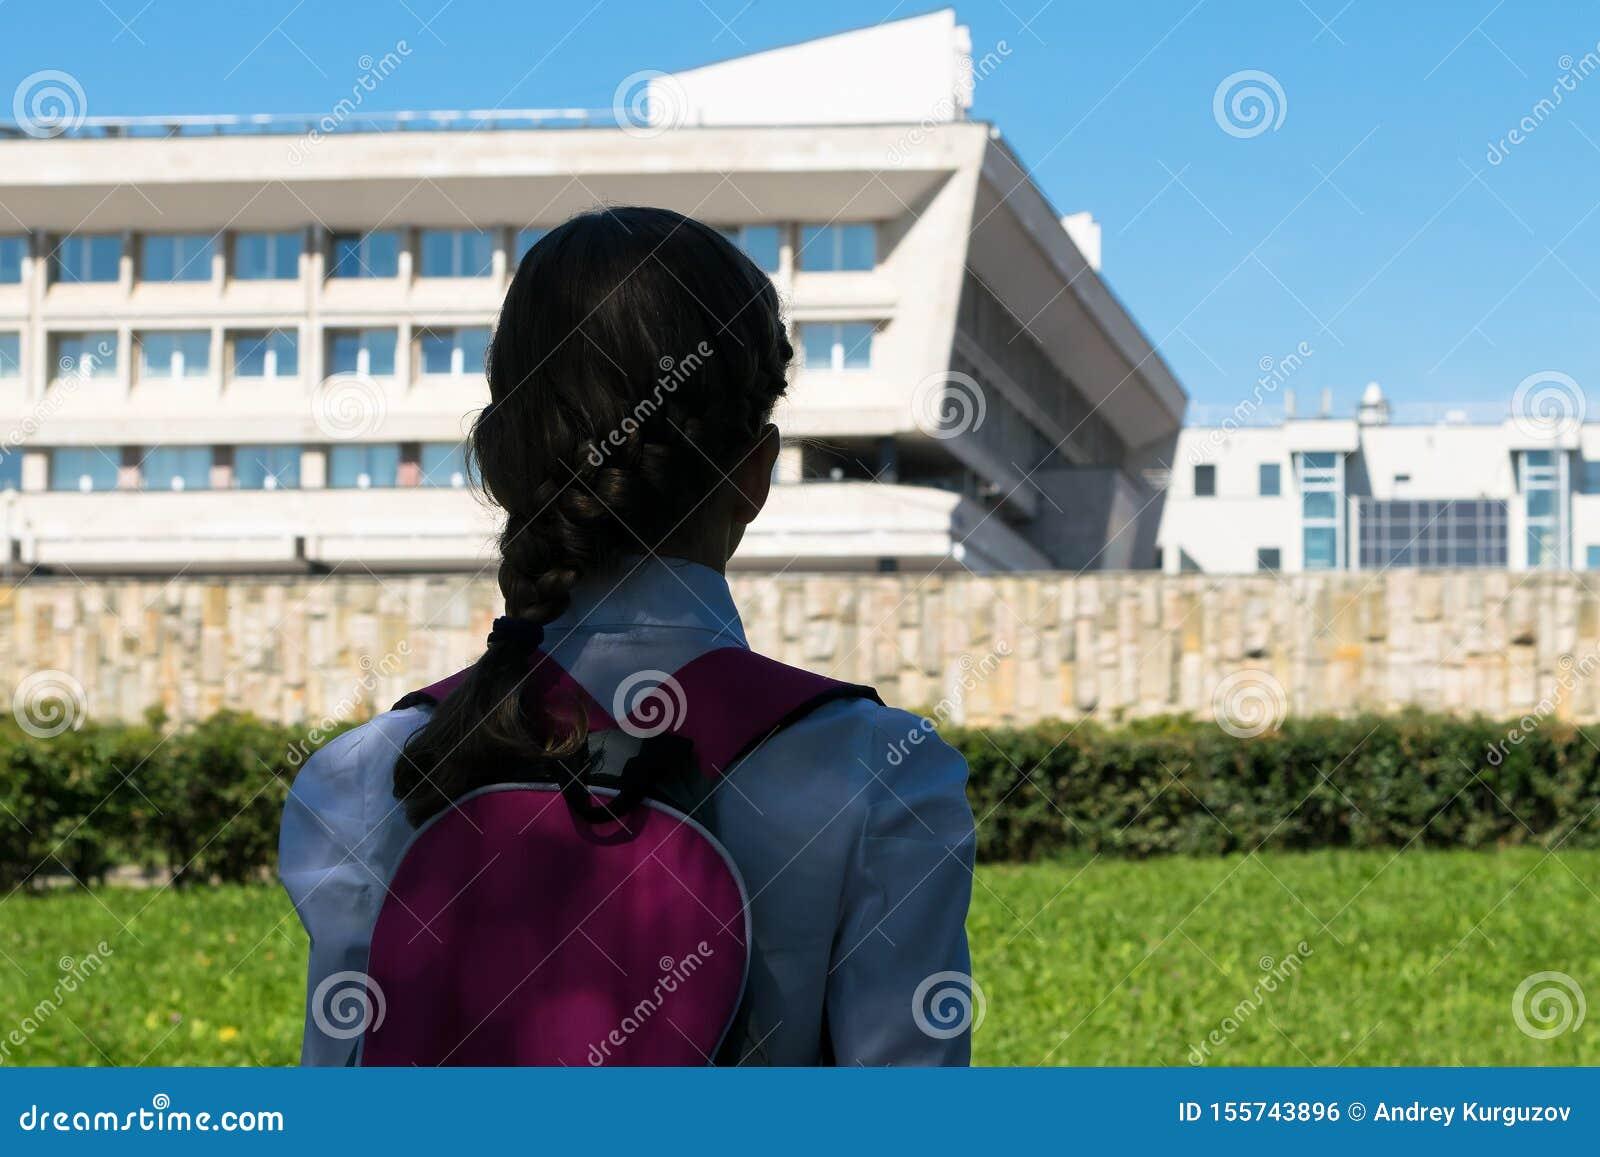 Girl in school uniform looking at the school building , rear view